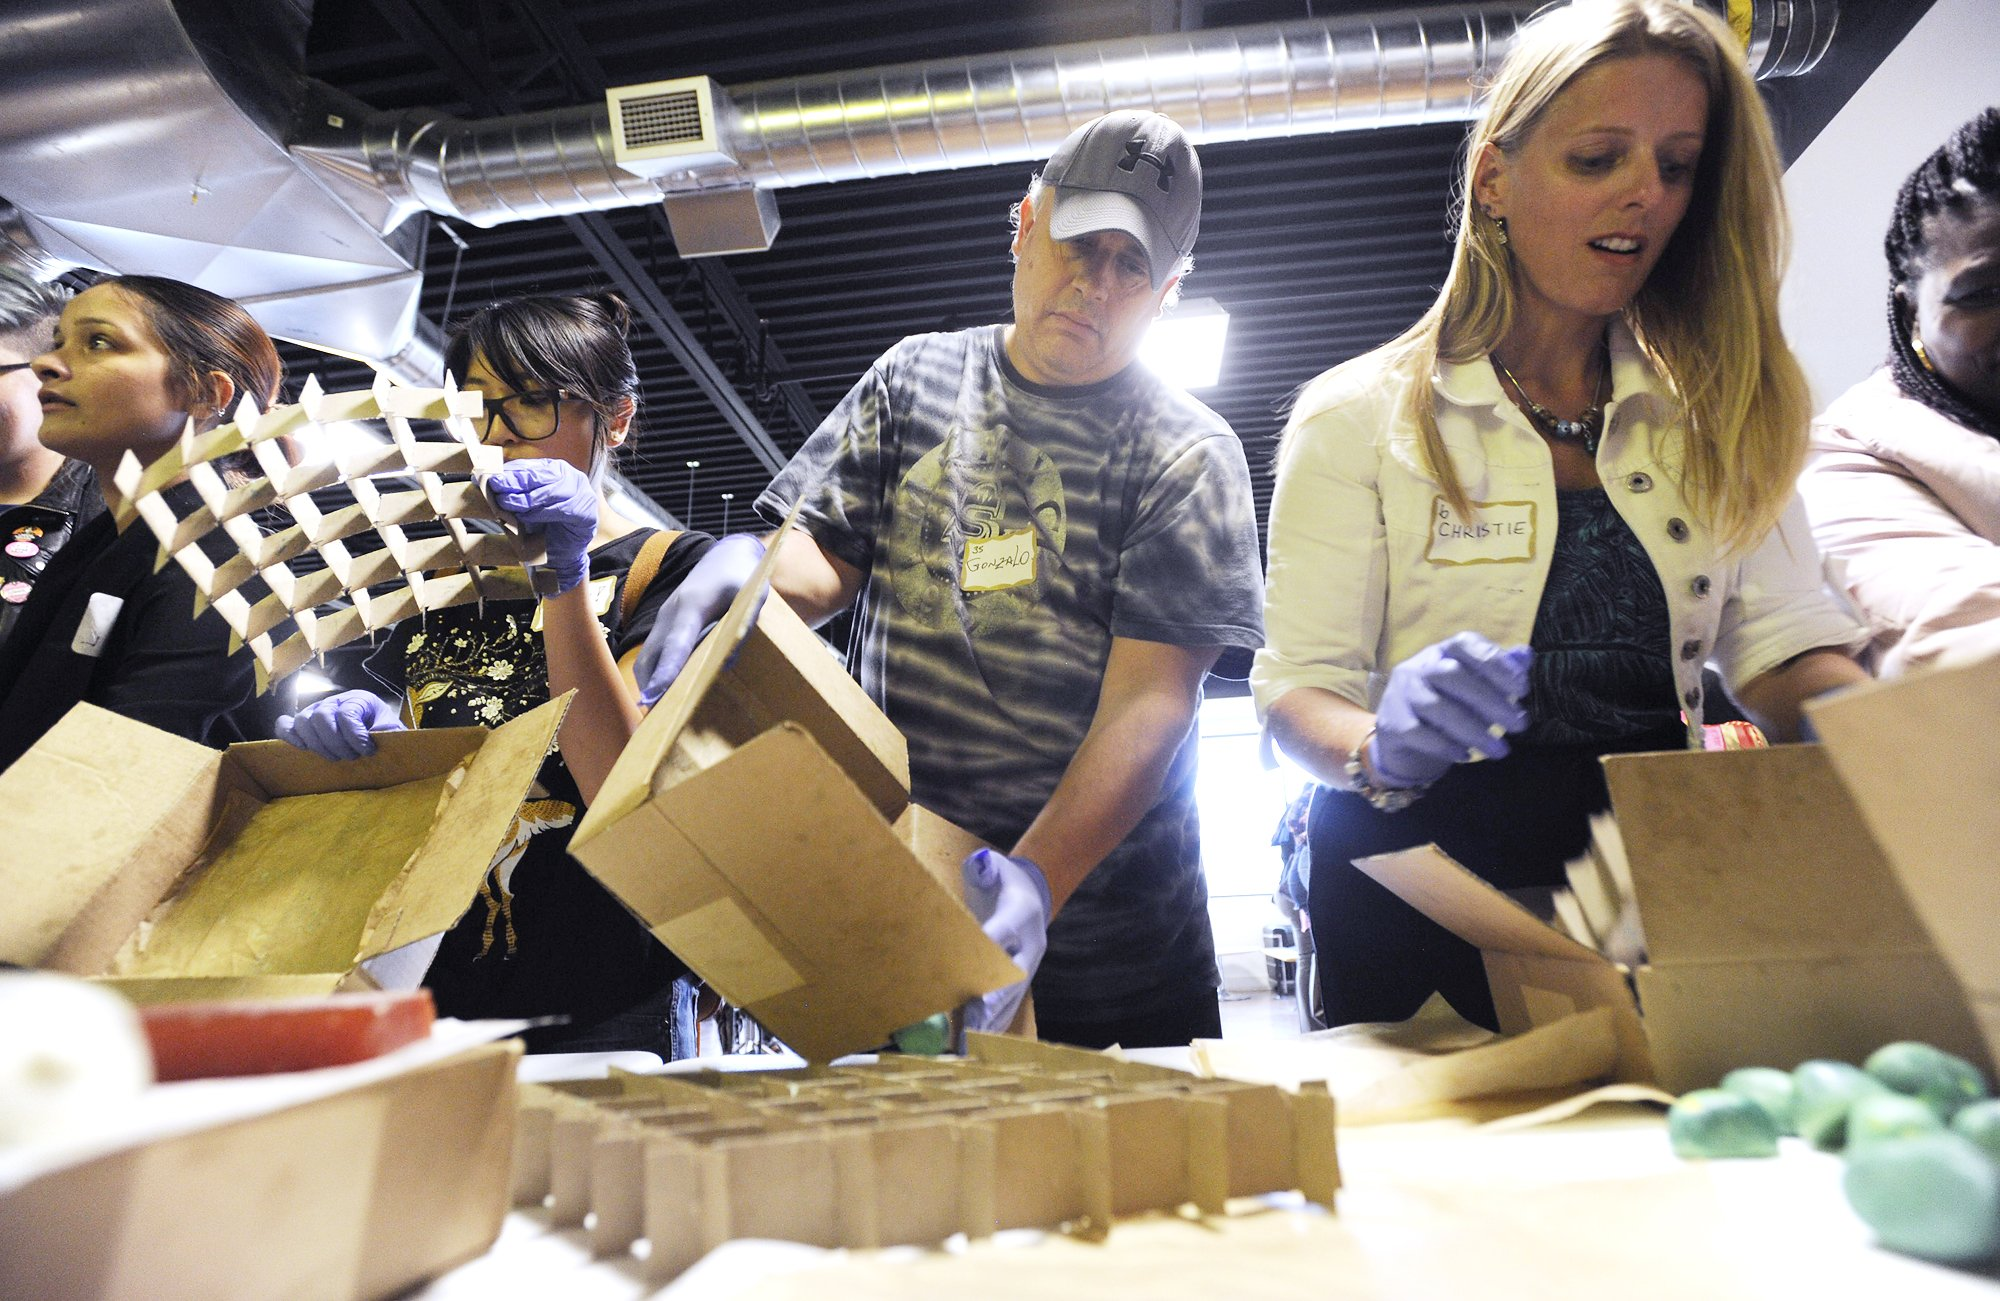 Lush Cosmetics hiring 1,400 seasonal workers at Etobicoke